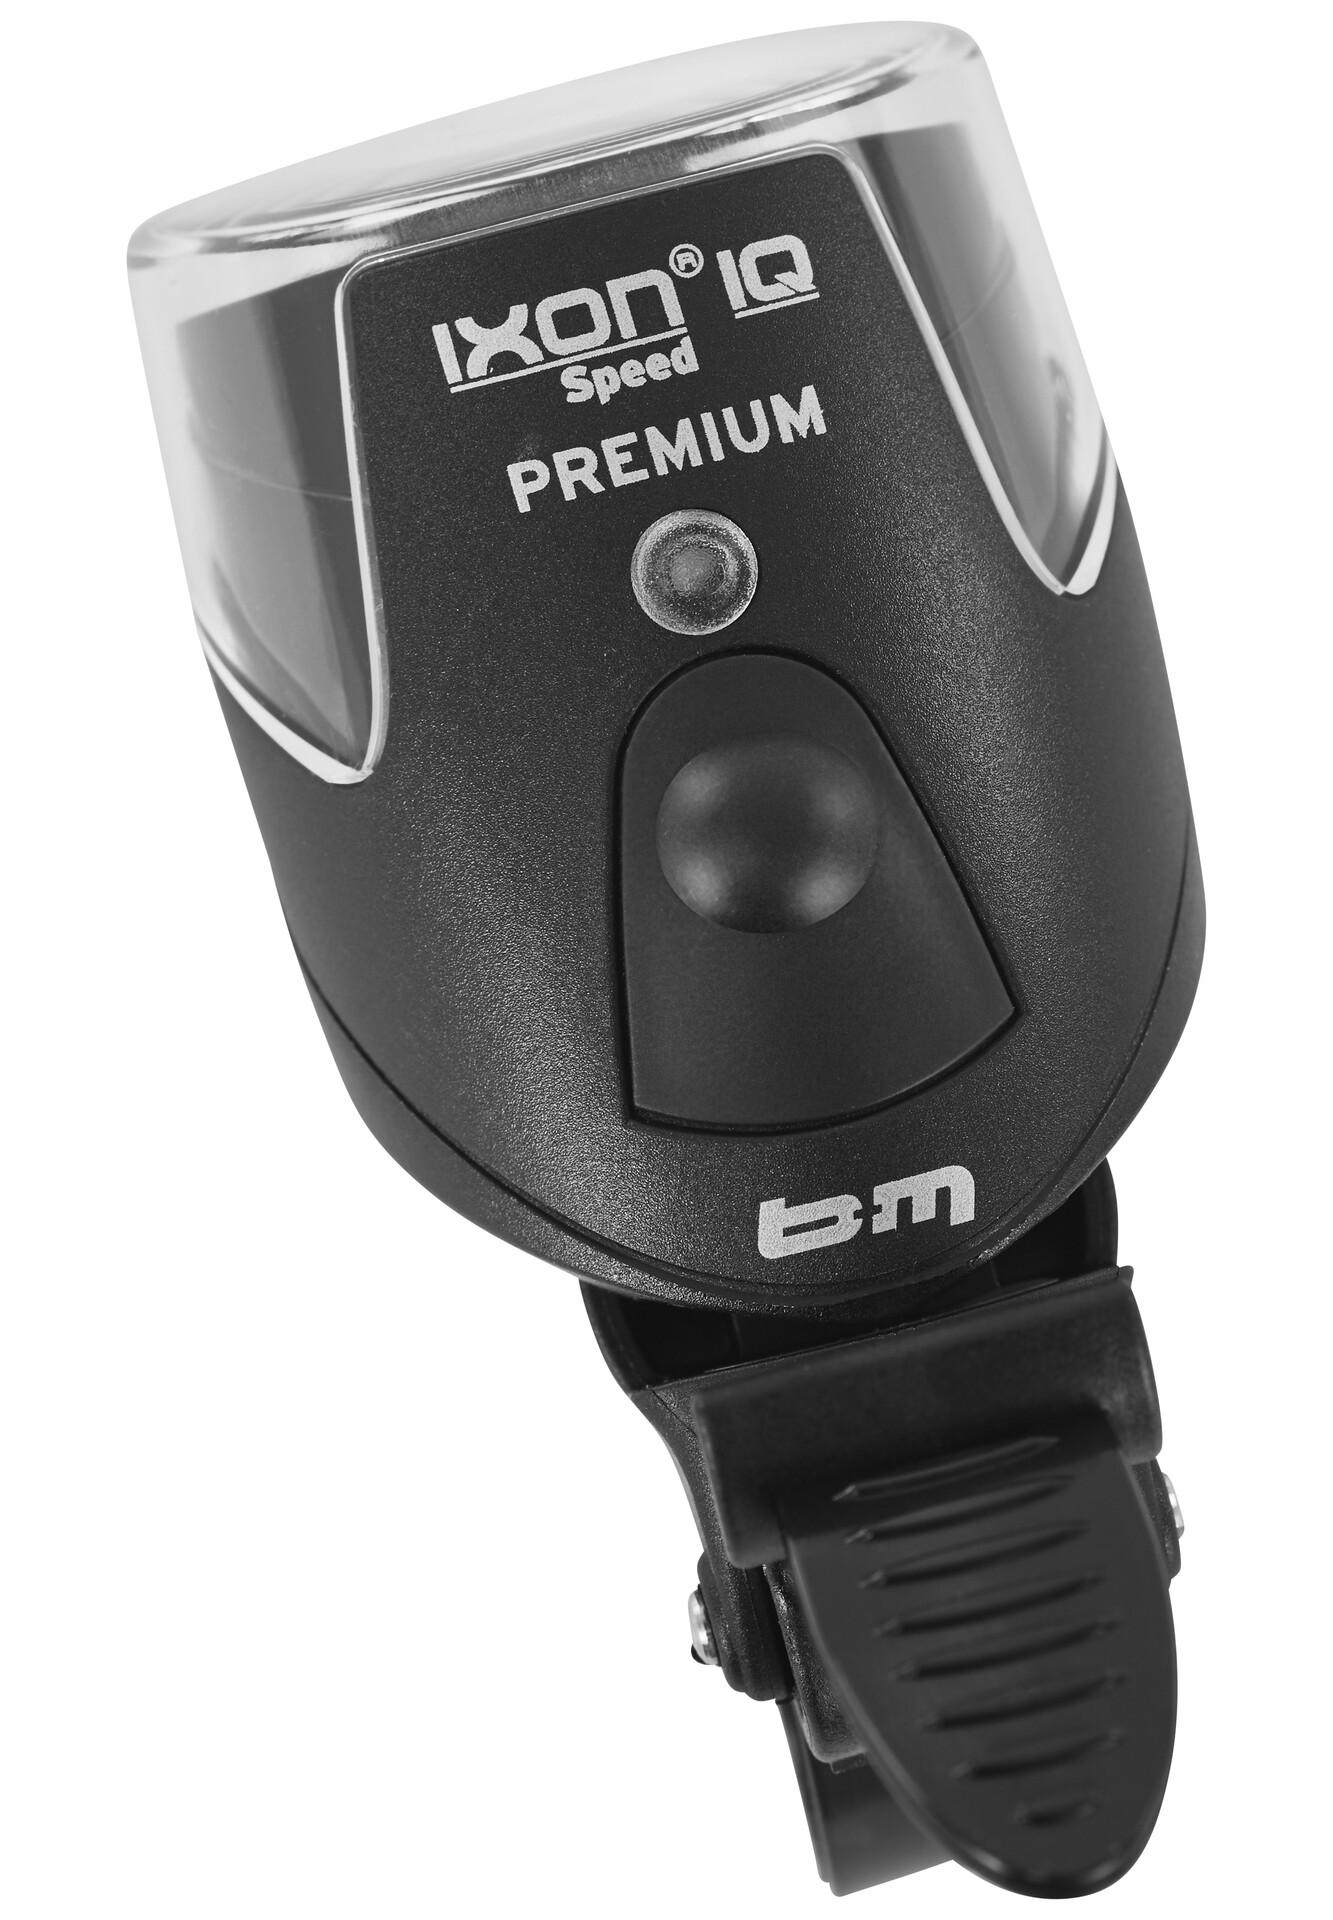 Premium Lampe Speed BuschMüller Ixon Iq Frontale ChargeurBlack Batterie 7Ybf6yg